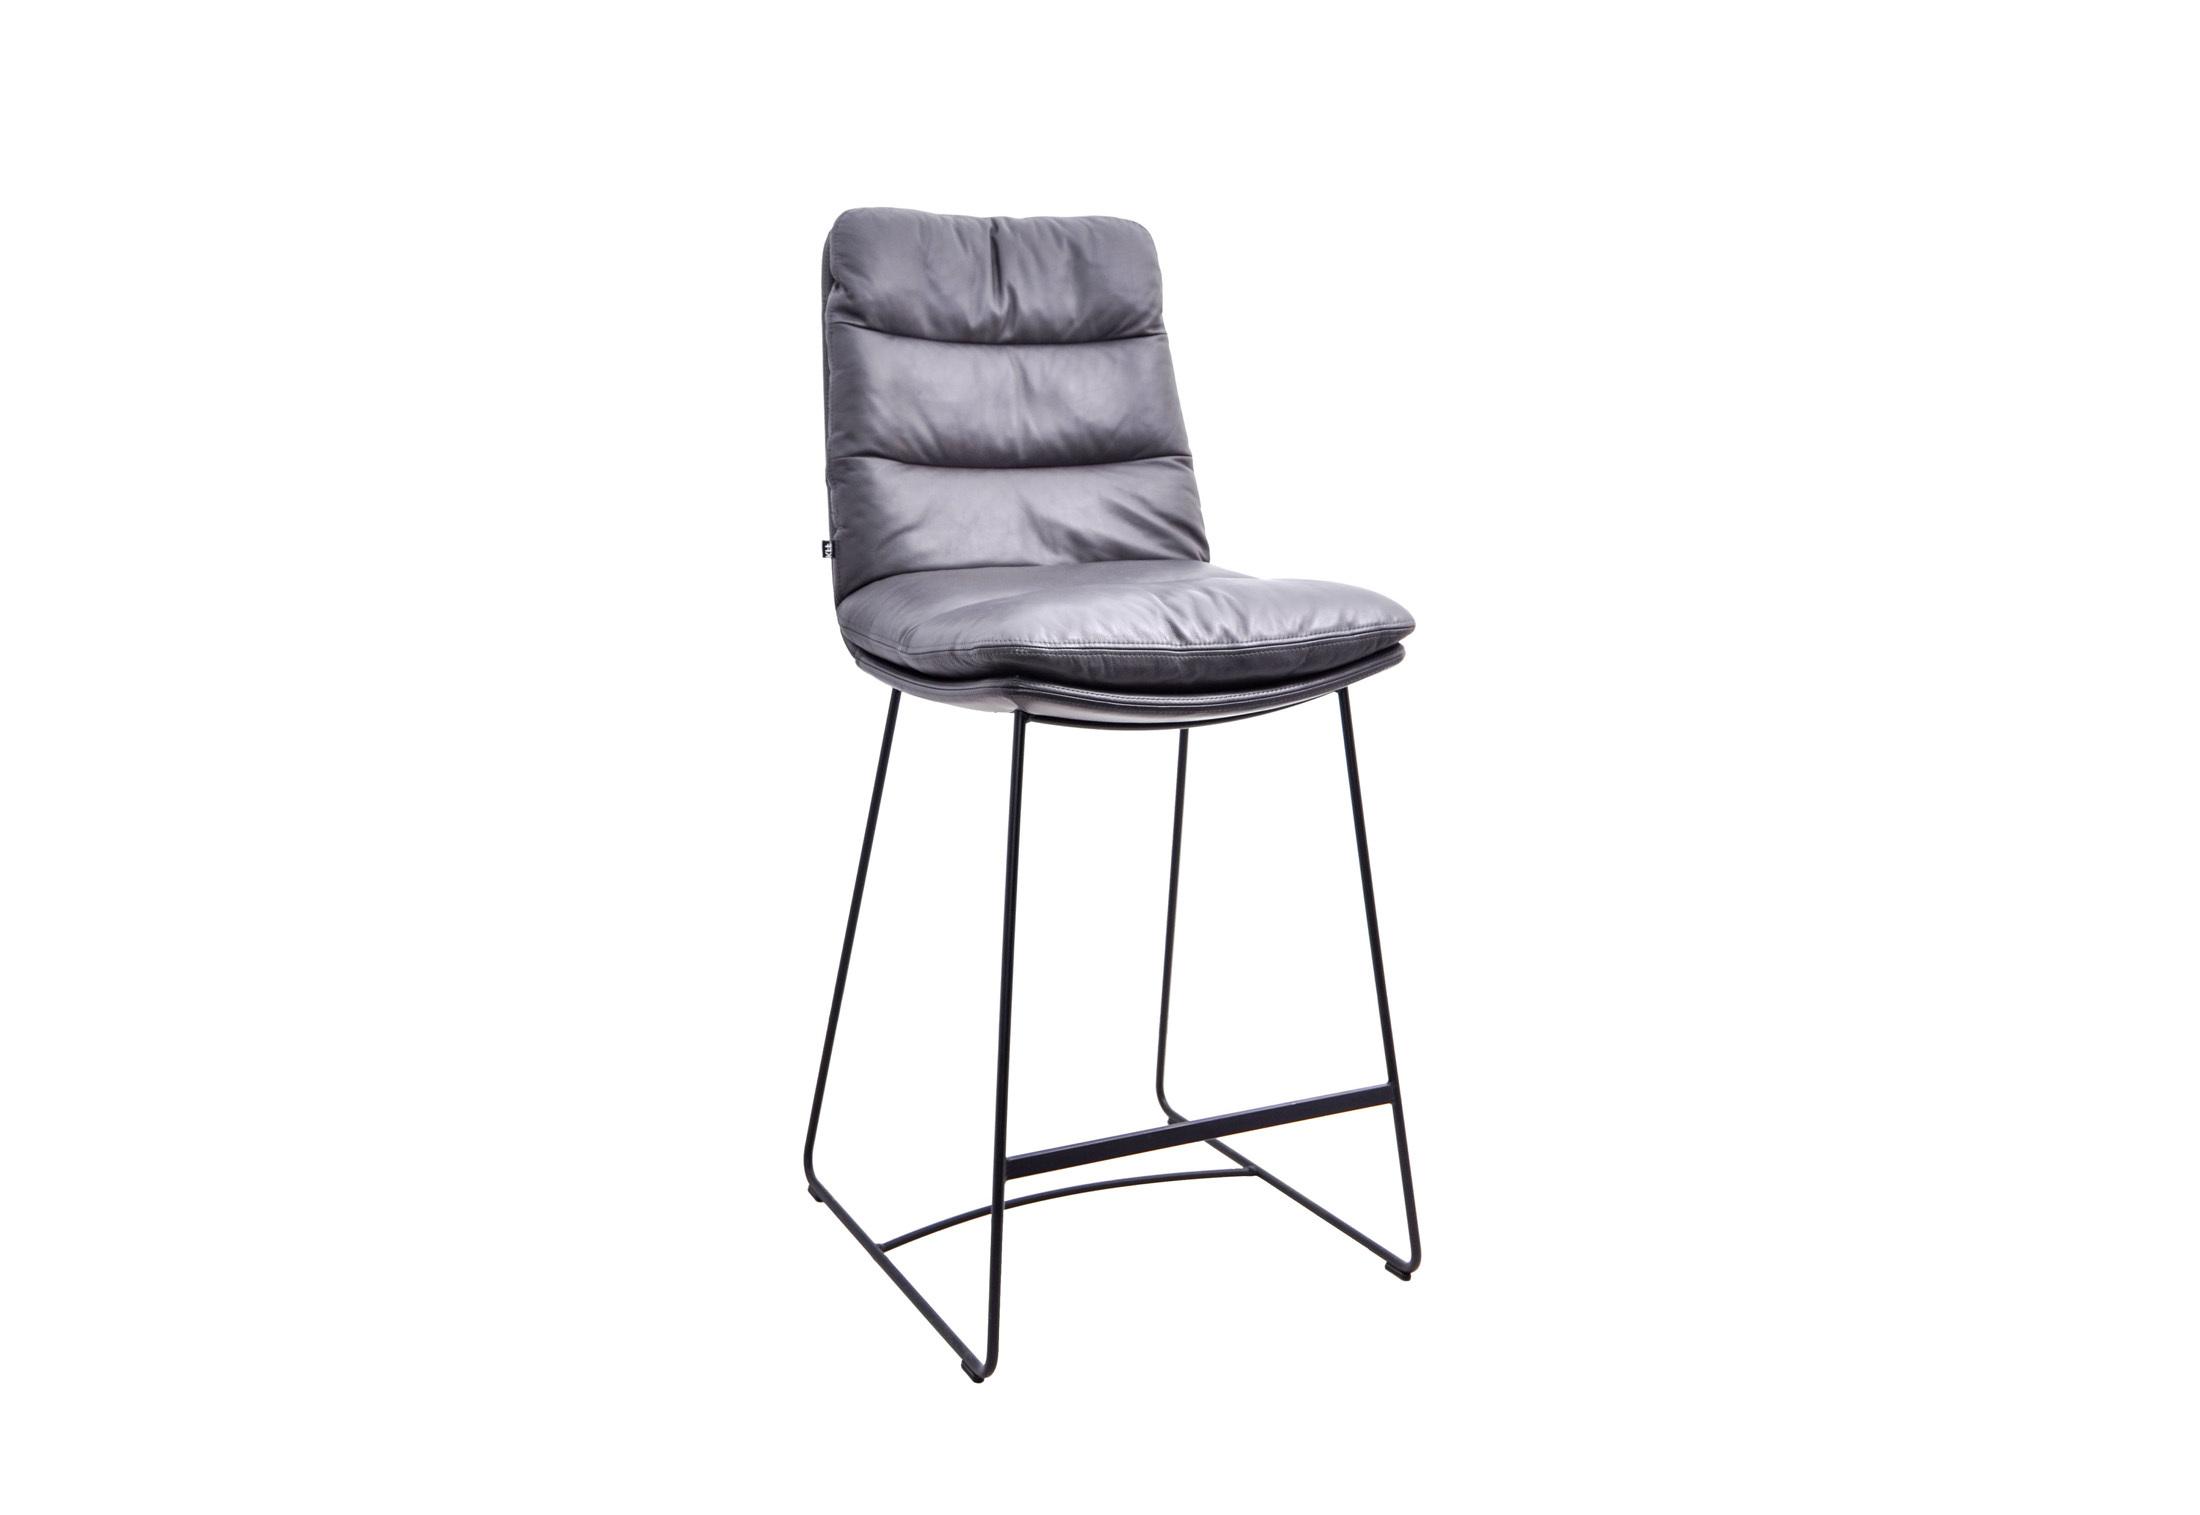 Arva Counter Chair By Kff Stylepark